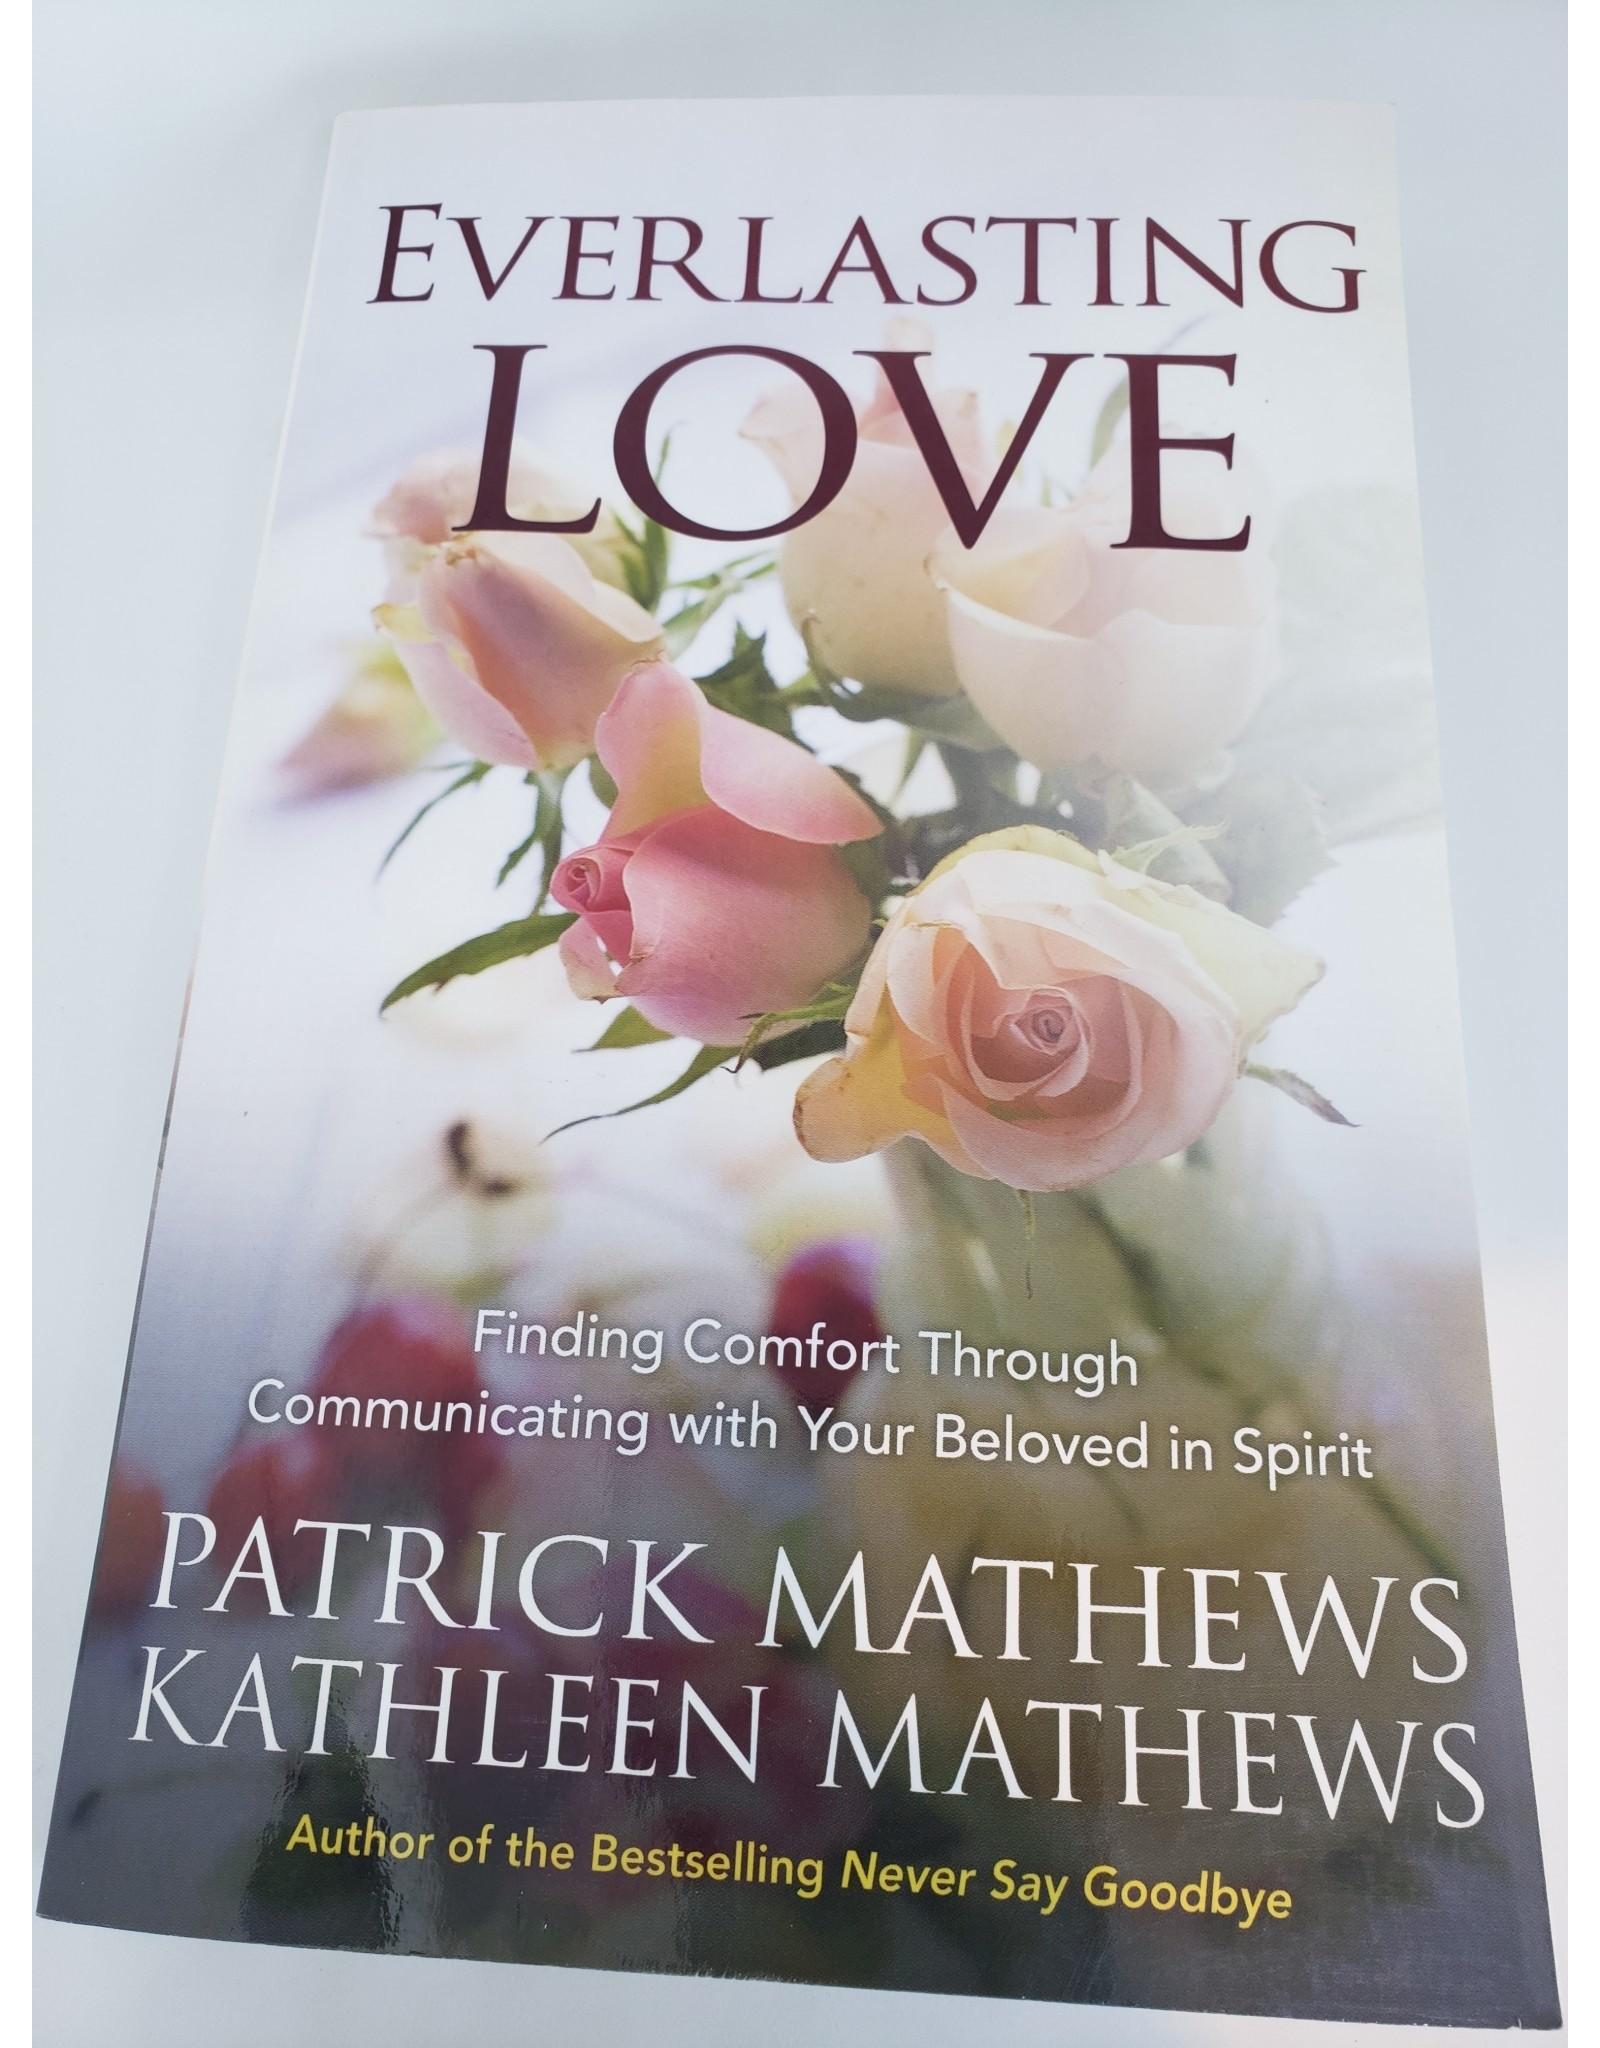 Everlasting Love by Patrick and Kathleen Mathews